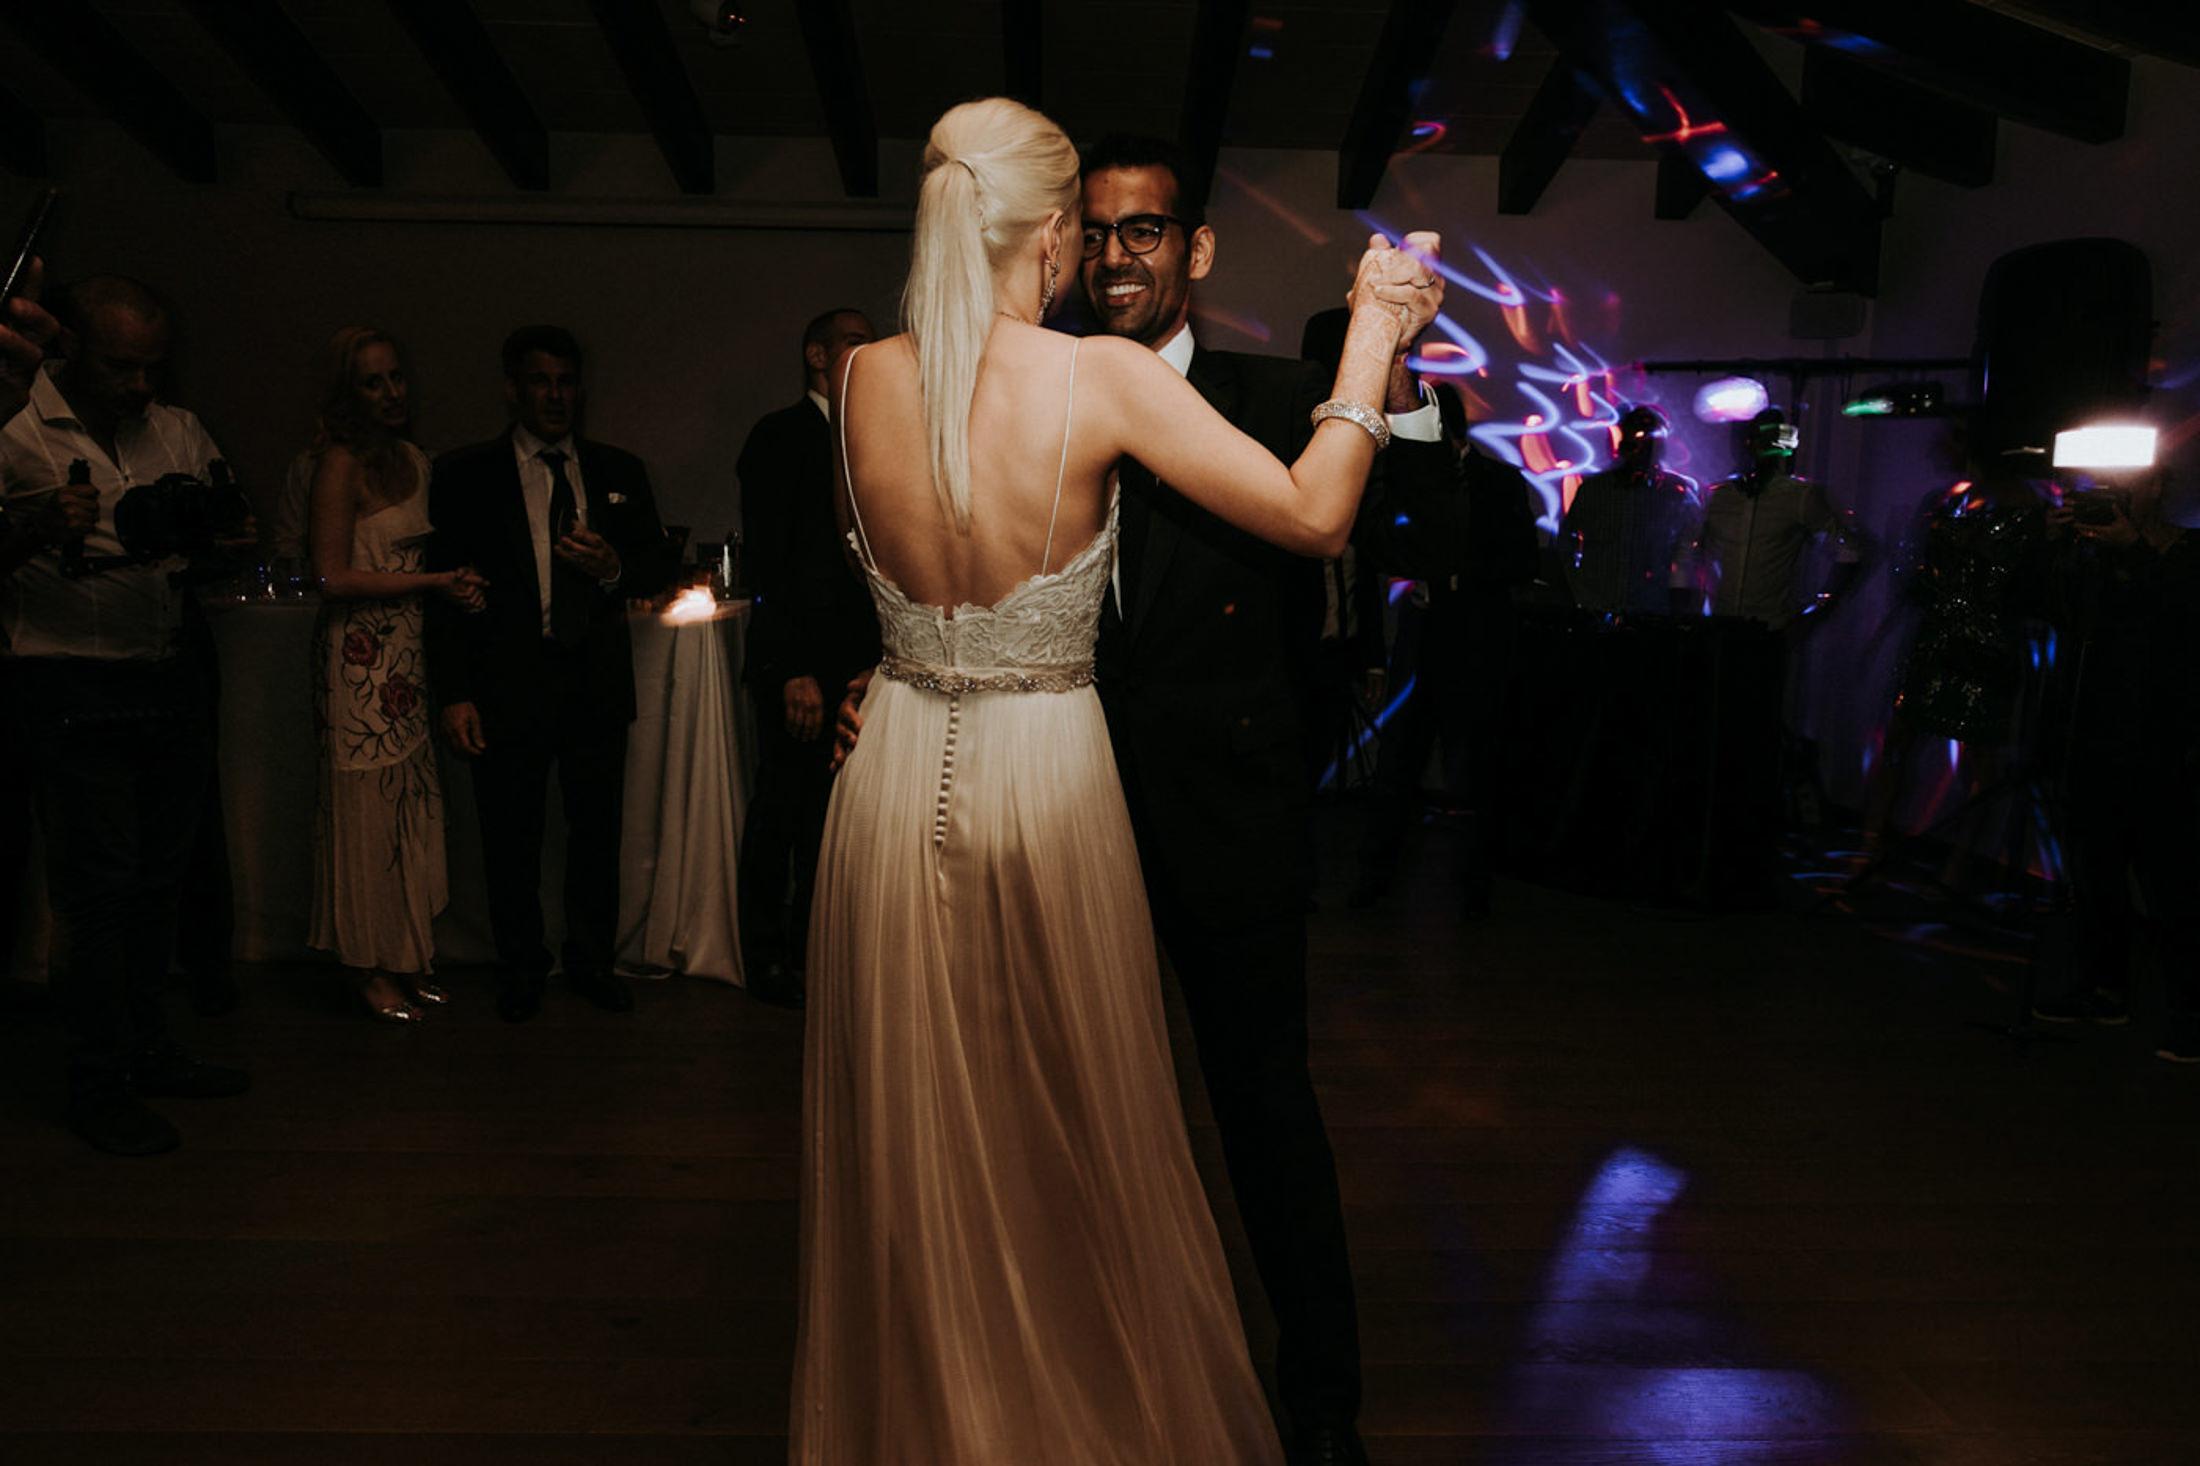 Wedding_Photographer_Mallorca_Daniela-Marquardt_Photography_New_York_Iceland_Tuscany_Santorini_Portugal_Austria_Bavaria_Elopement_Hochzeitsfotograf_AntjeRajat2_119